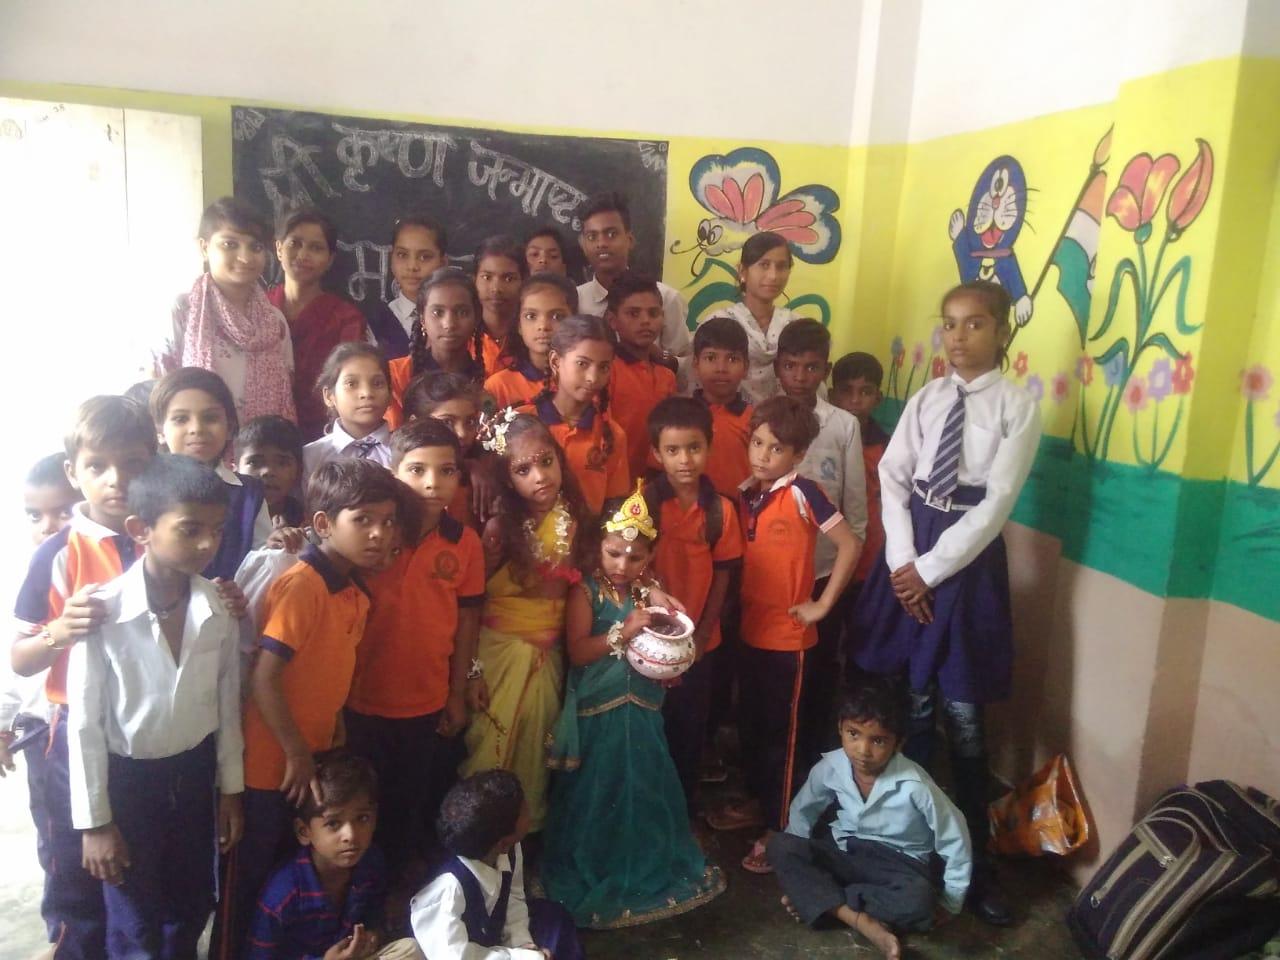 Schools Kids celebrate Krishna Janmashtami Utsav